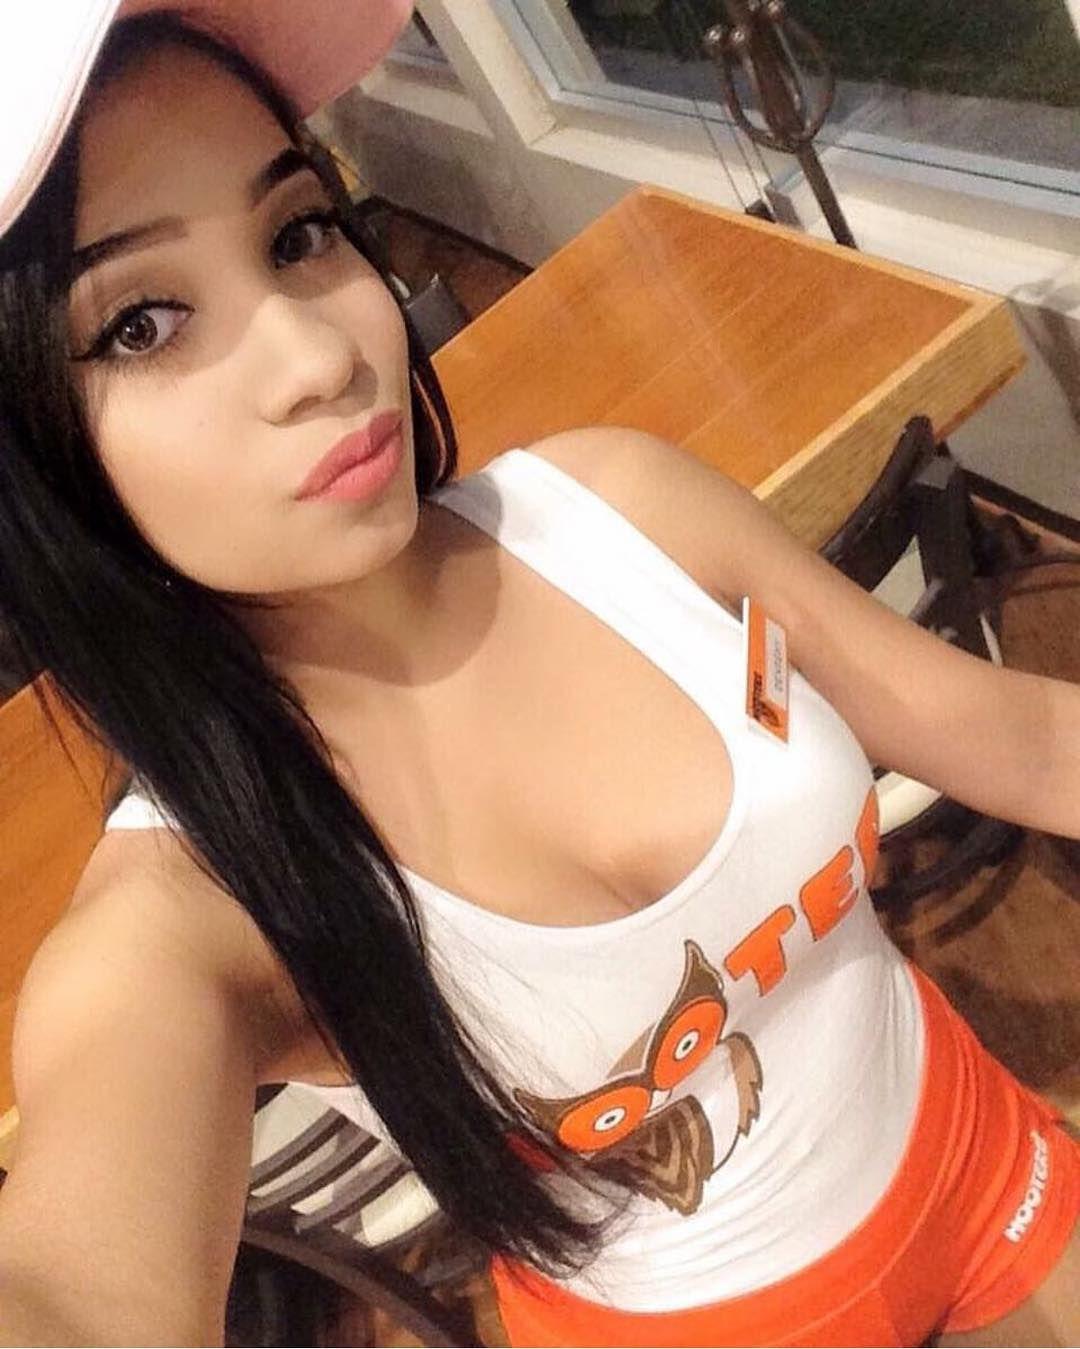 @angievaronafansmex @latinasss__lindasss2017 #model #latina #amateur #zing  #anonima #sexy